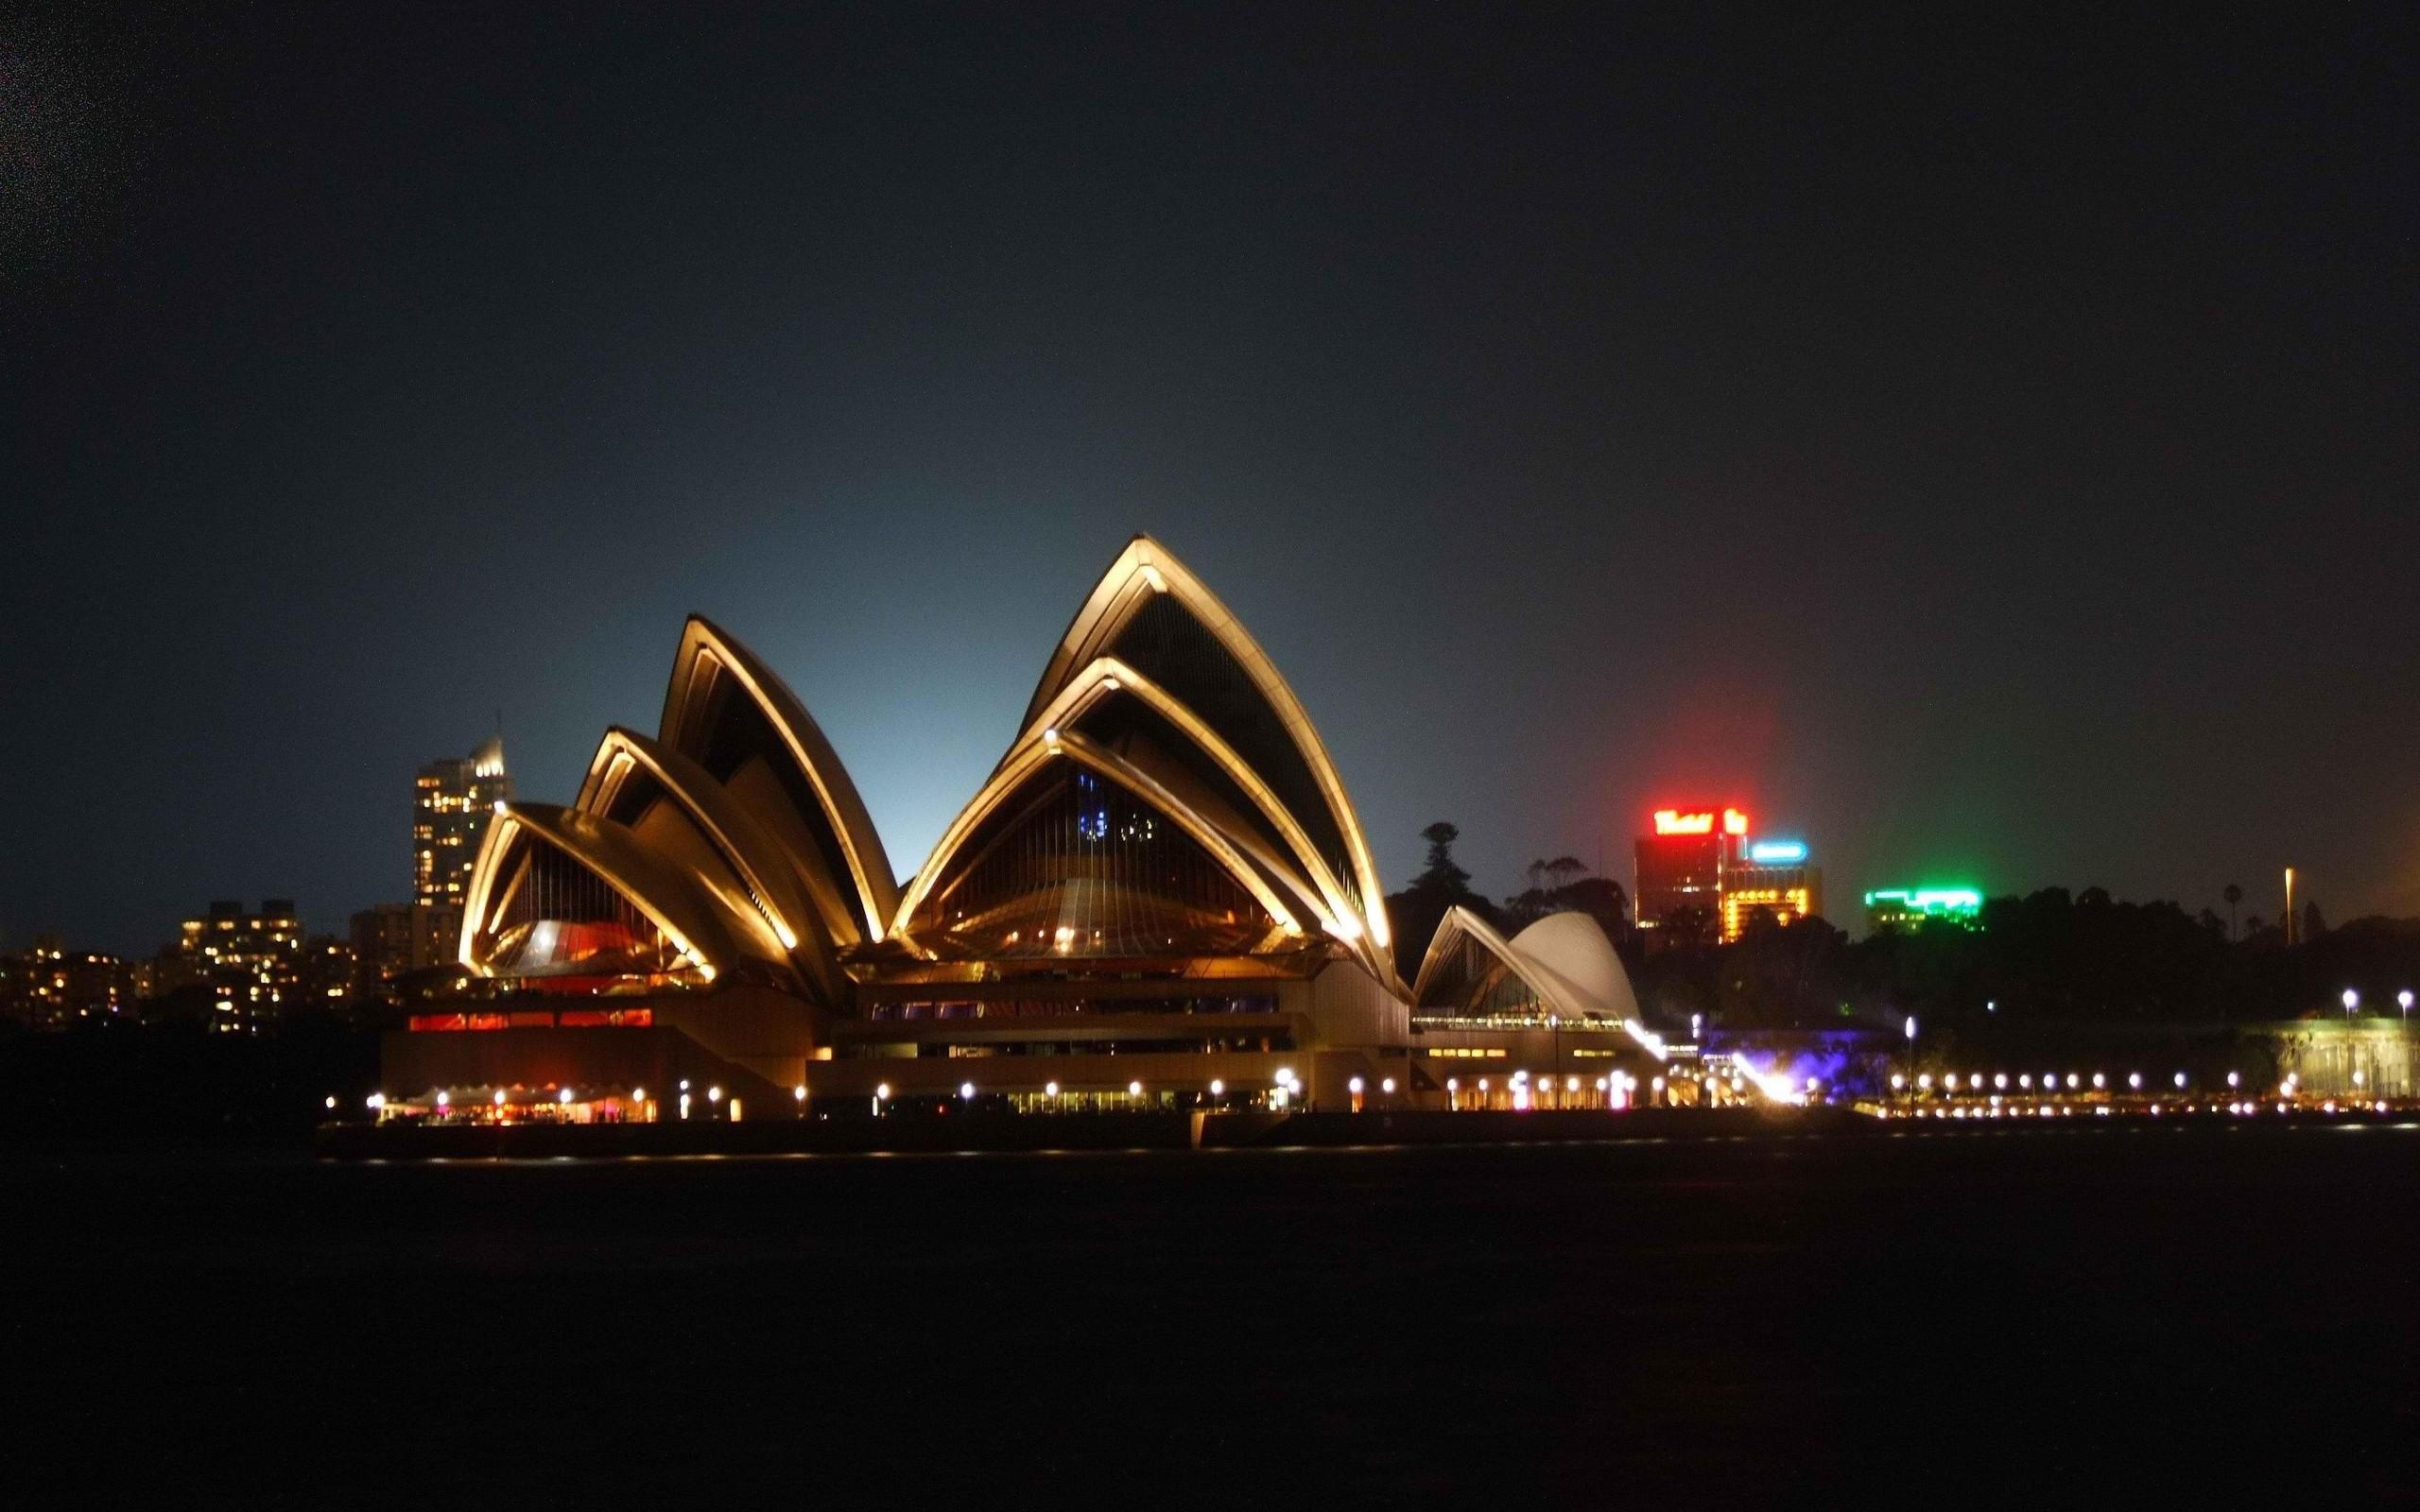 Sydney Opera House Australia Wallpaper   Travel HD Wallpapers 2560x1600